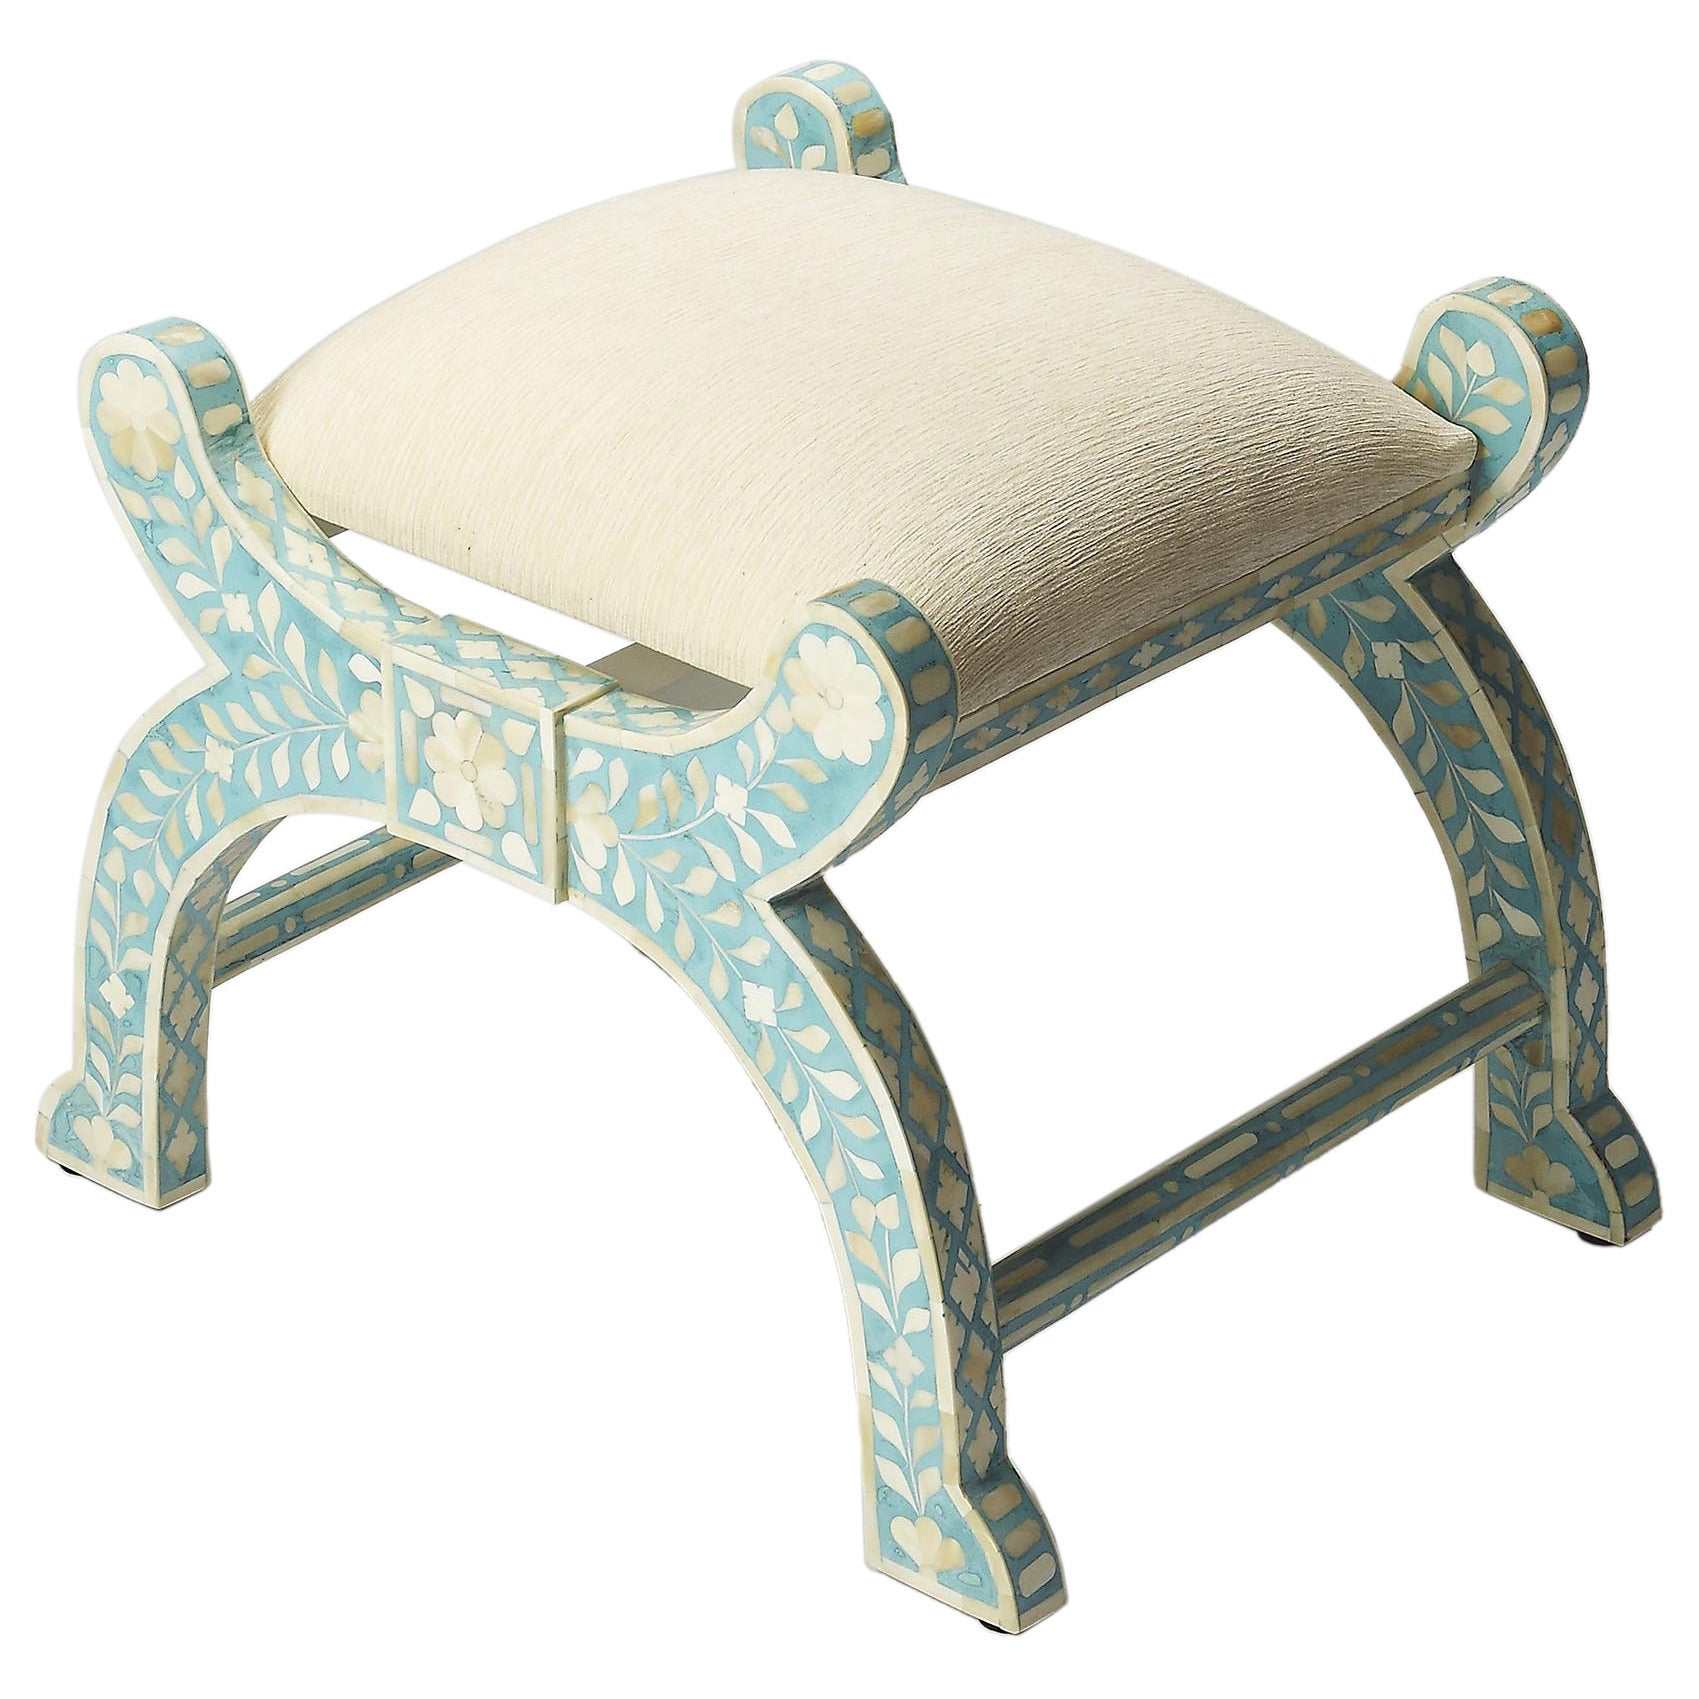 Peachy Butler Vivienne Traditional Hand Carved Jade Bone Inlay Wooden Stool Green Creativecarmelina Interior Chair Design Creativecarmelinacom